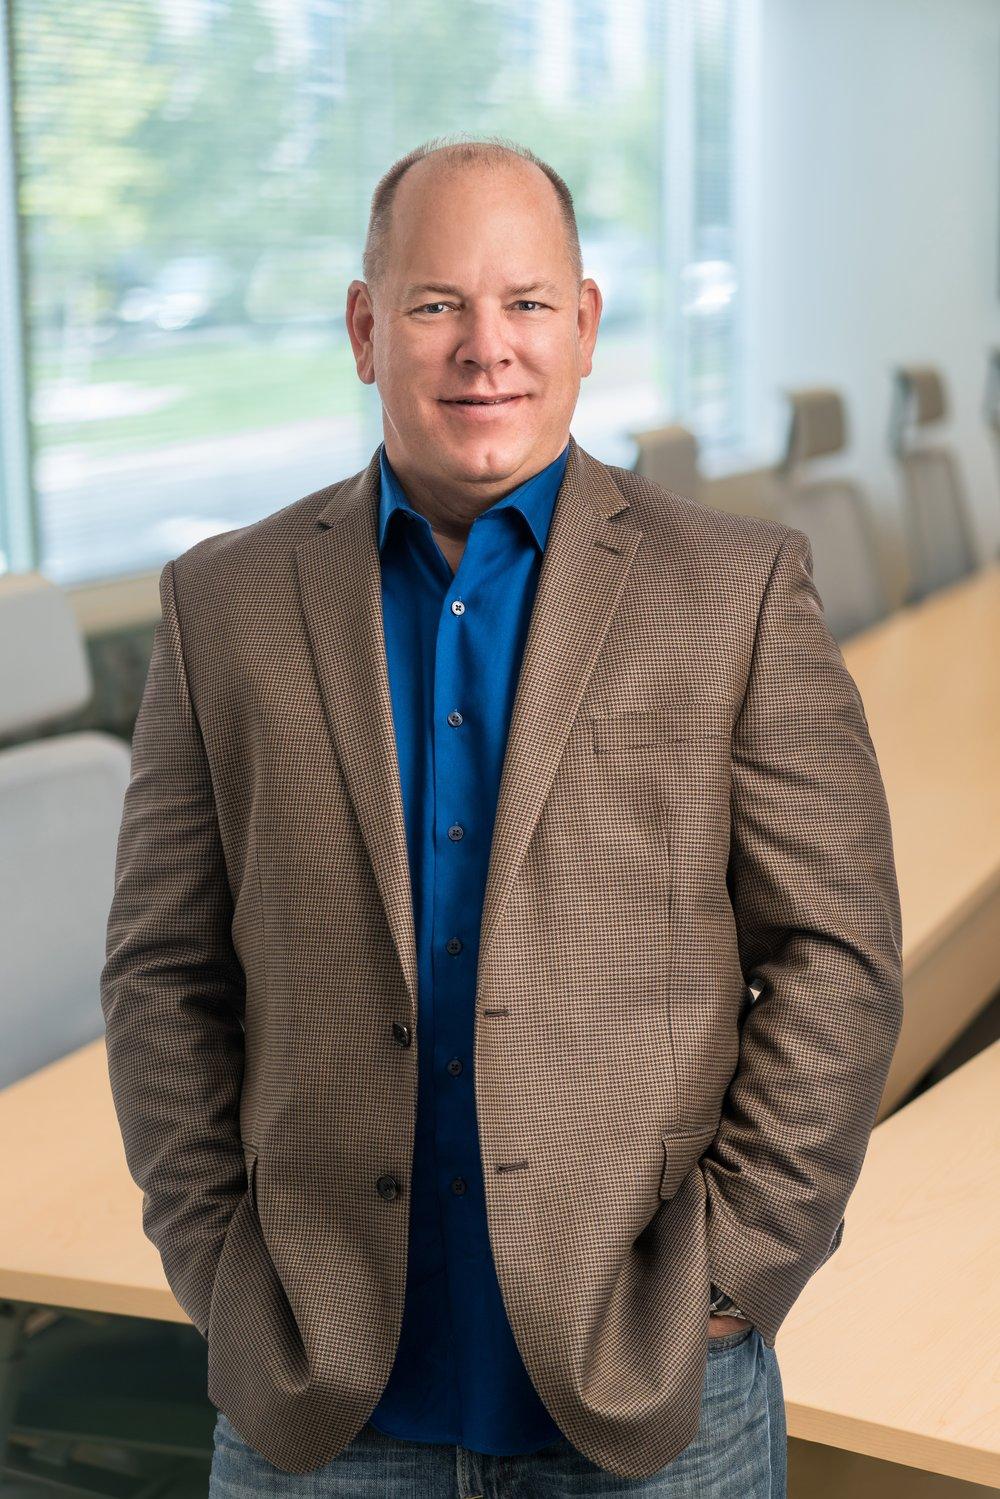 Kirk Haselden, VP of Engineering at Dealertrack DMS